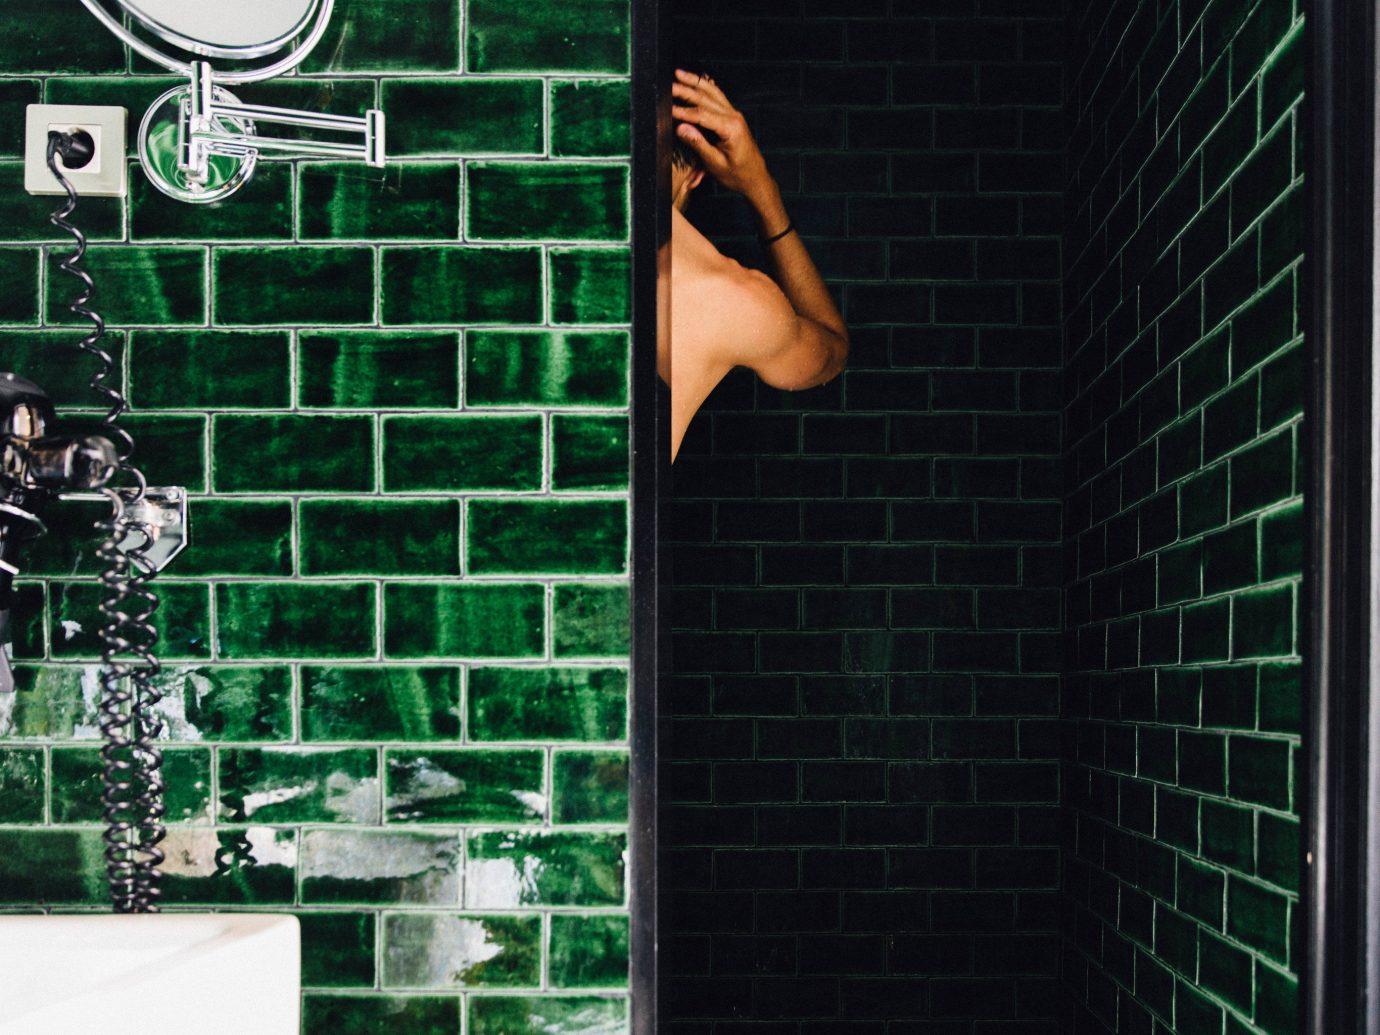 Hotels color green black wall light art lighting interior design window Design tiled